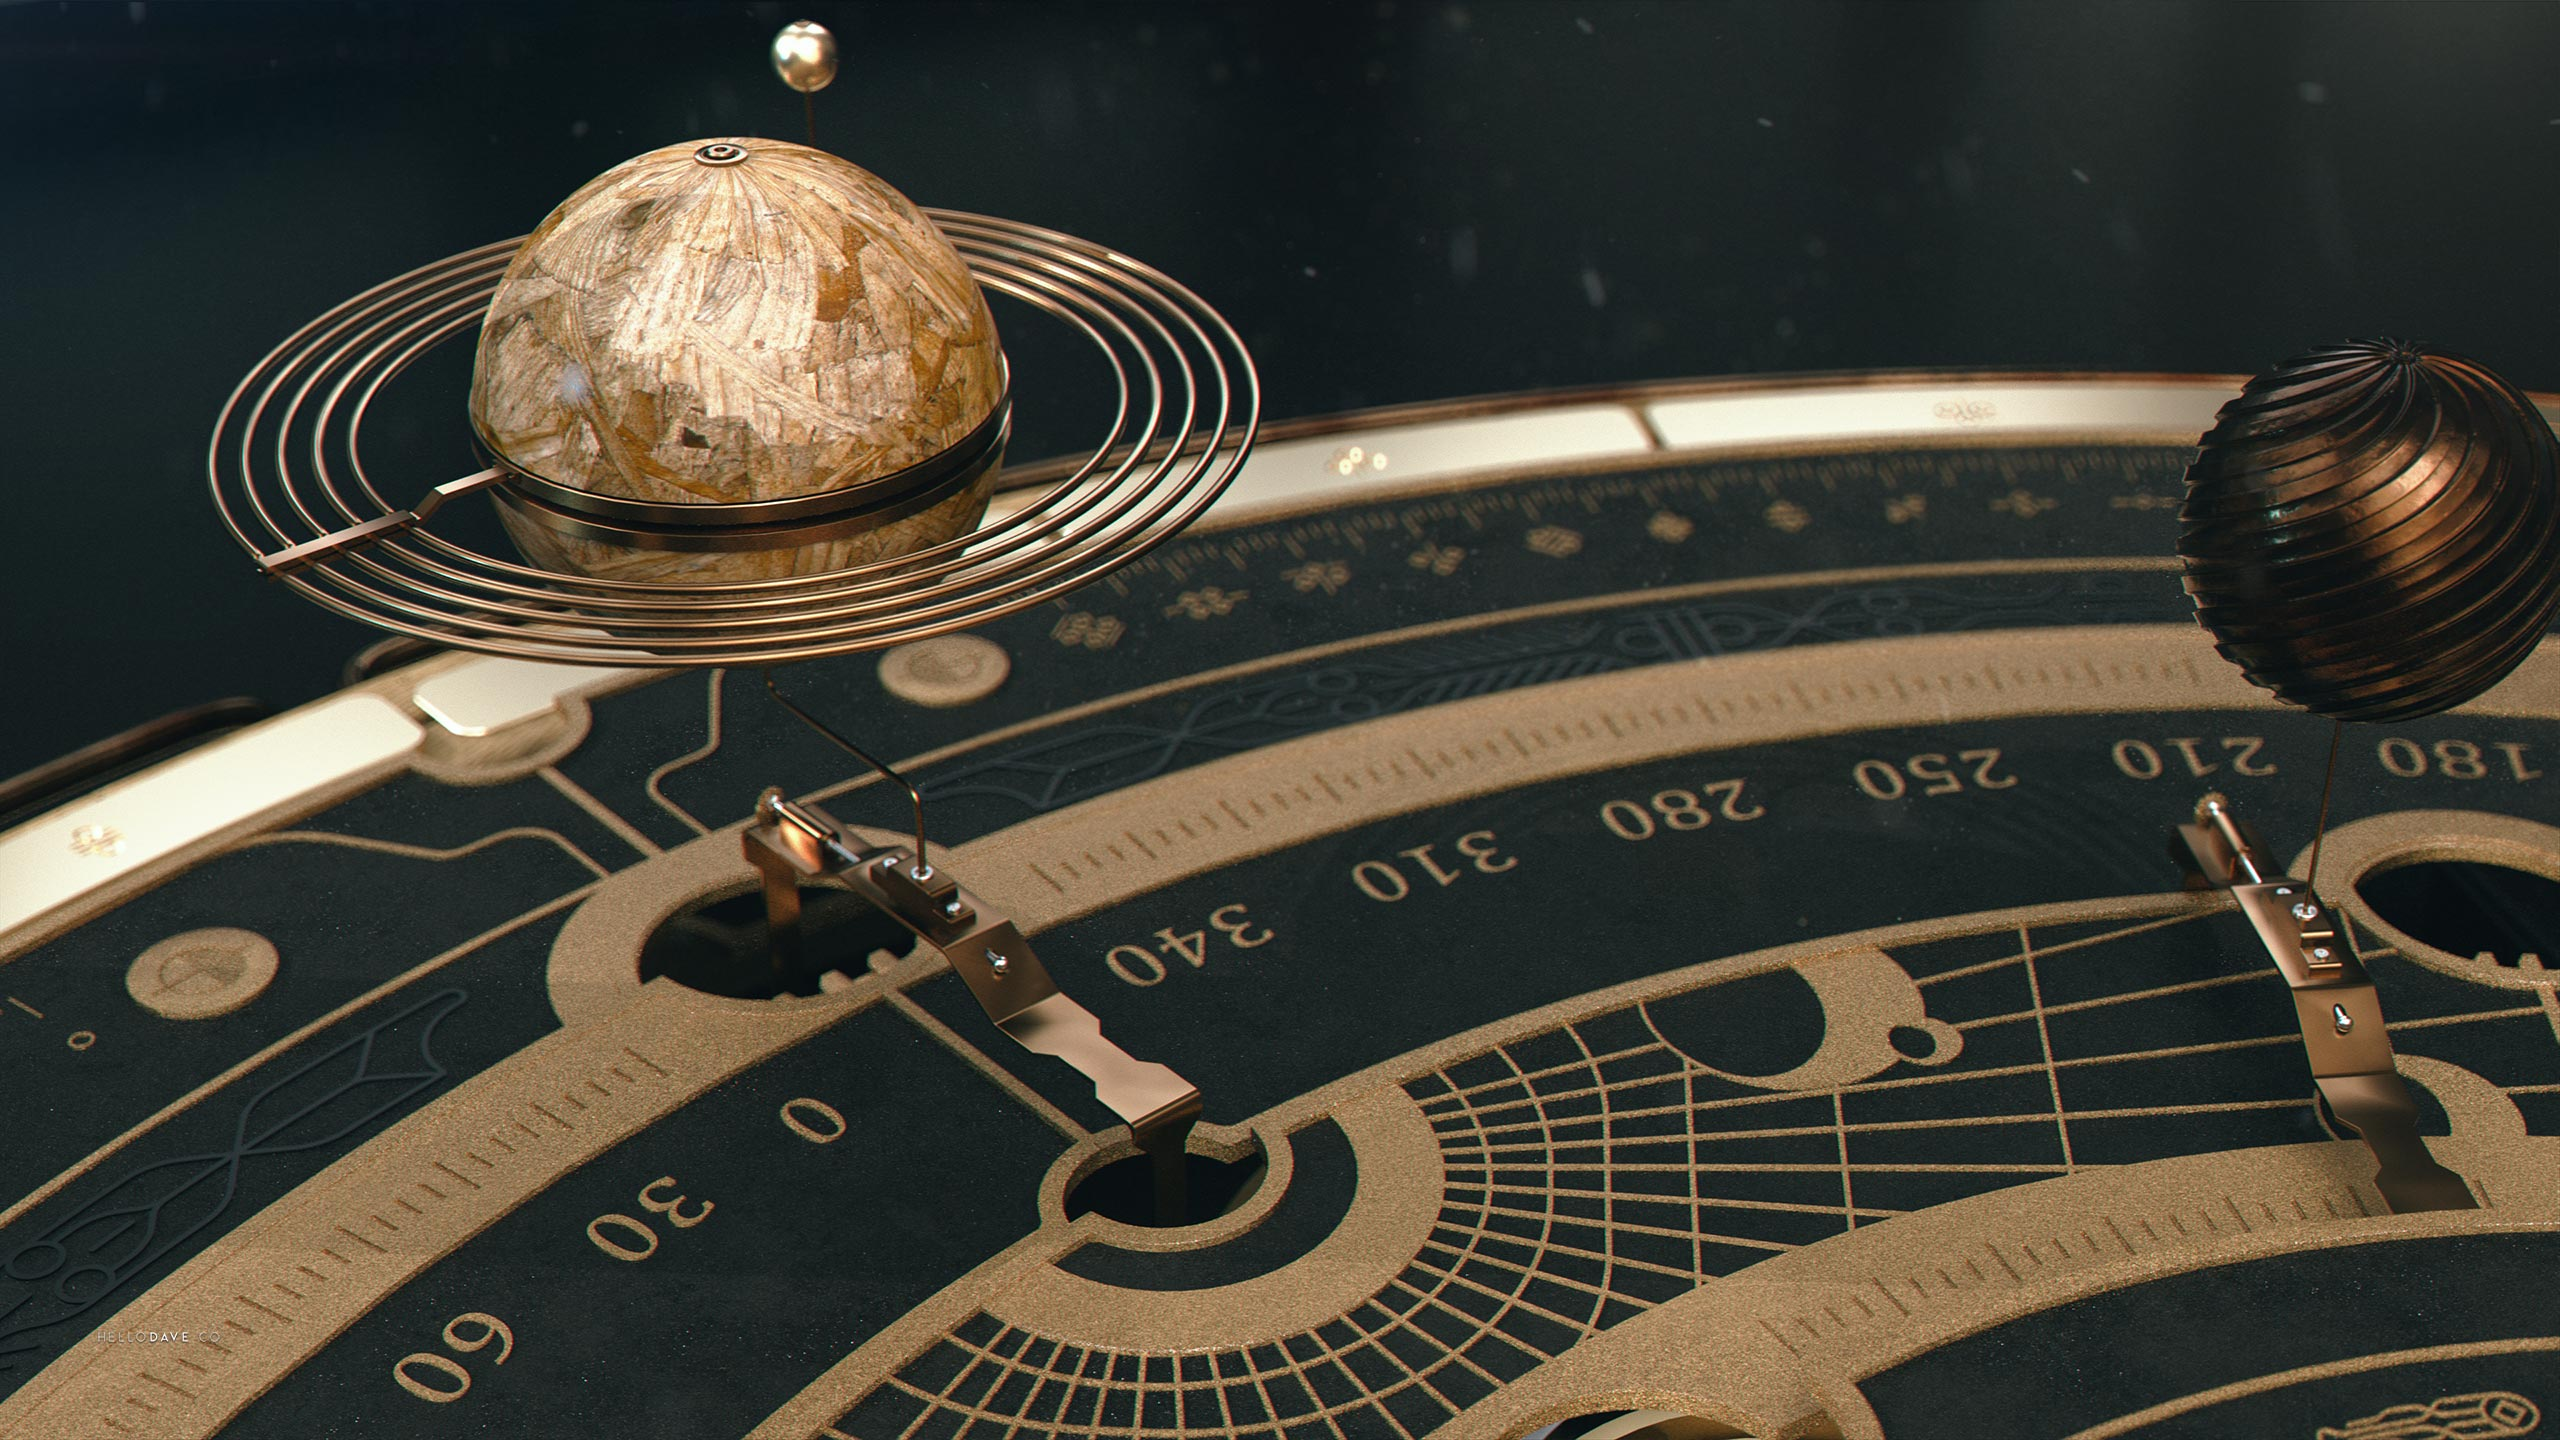 Steampunk_table_astrolabe_02_2K